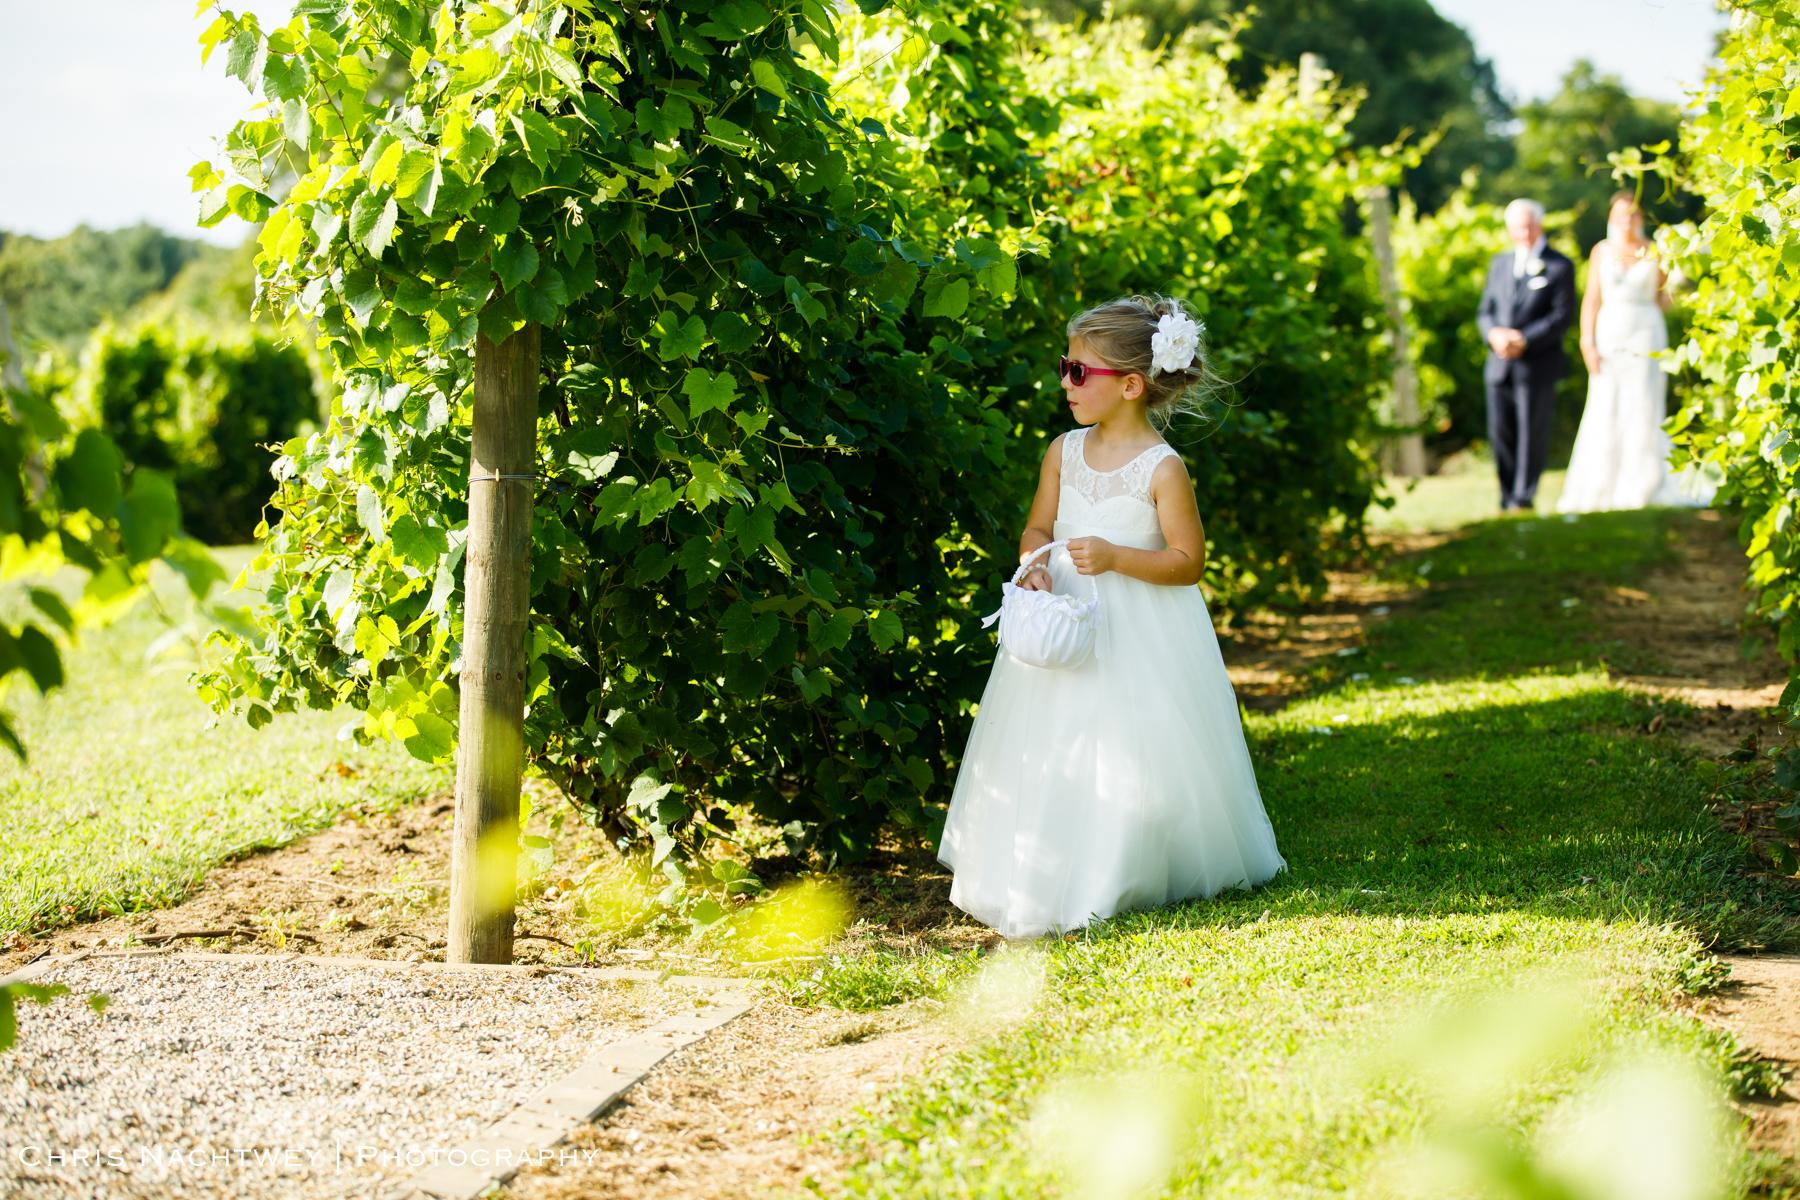 wedding-lake-of-isles-photos-chris-nachtwey-photography-2019-28.jpg